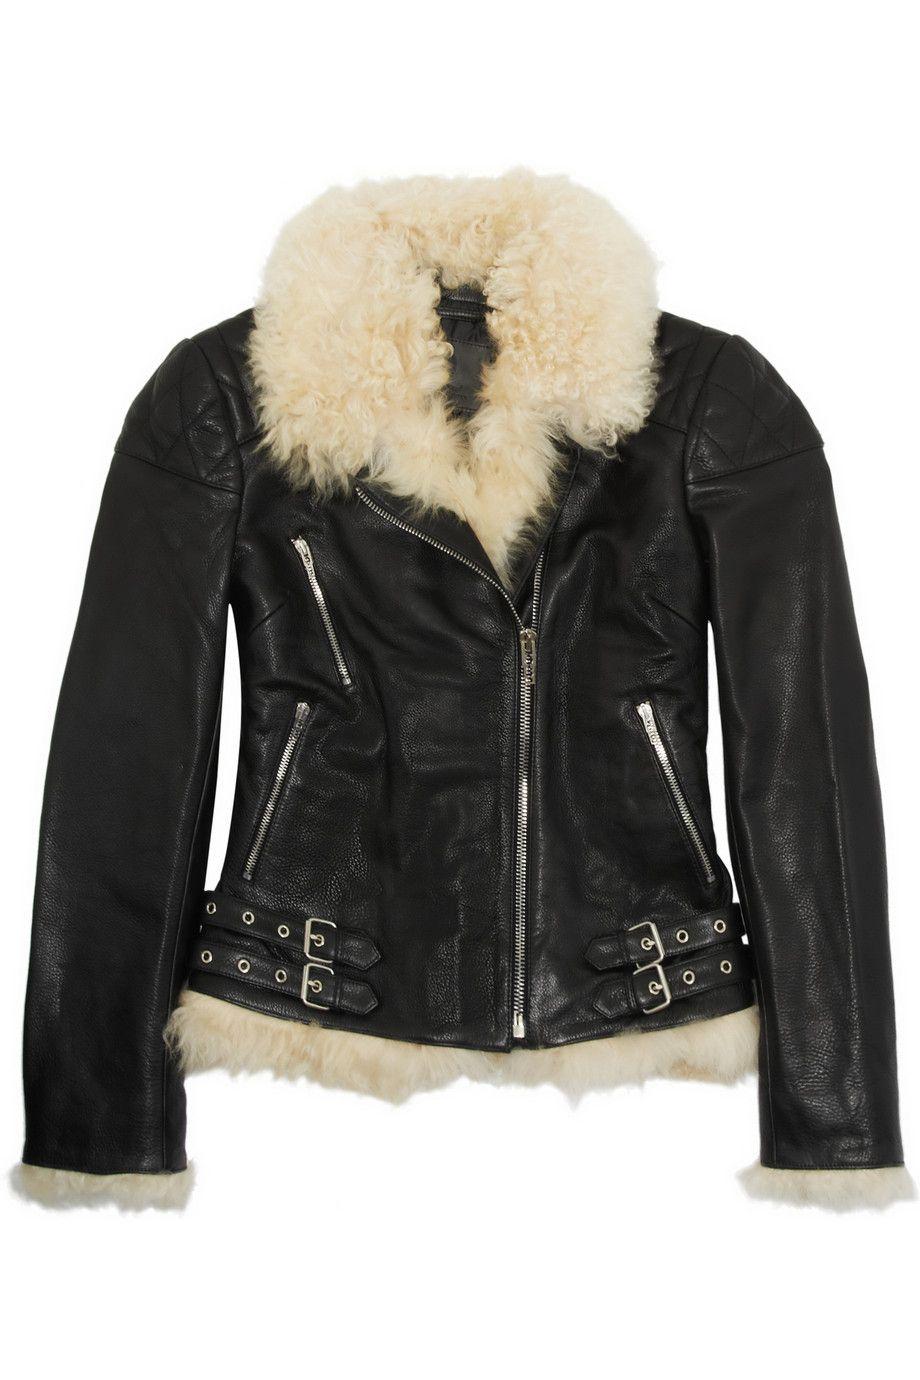 Mcq By Alexander Mcqueen Shearlinglined Texturedleather Biker Jacket in Black.. Cozy